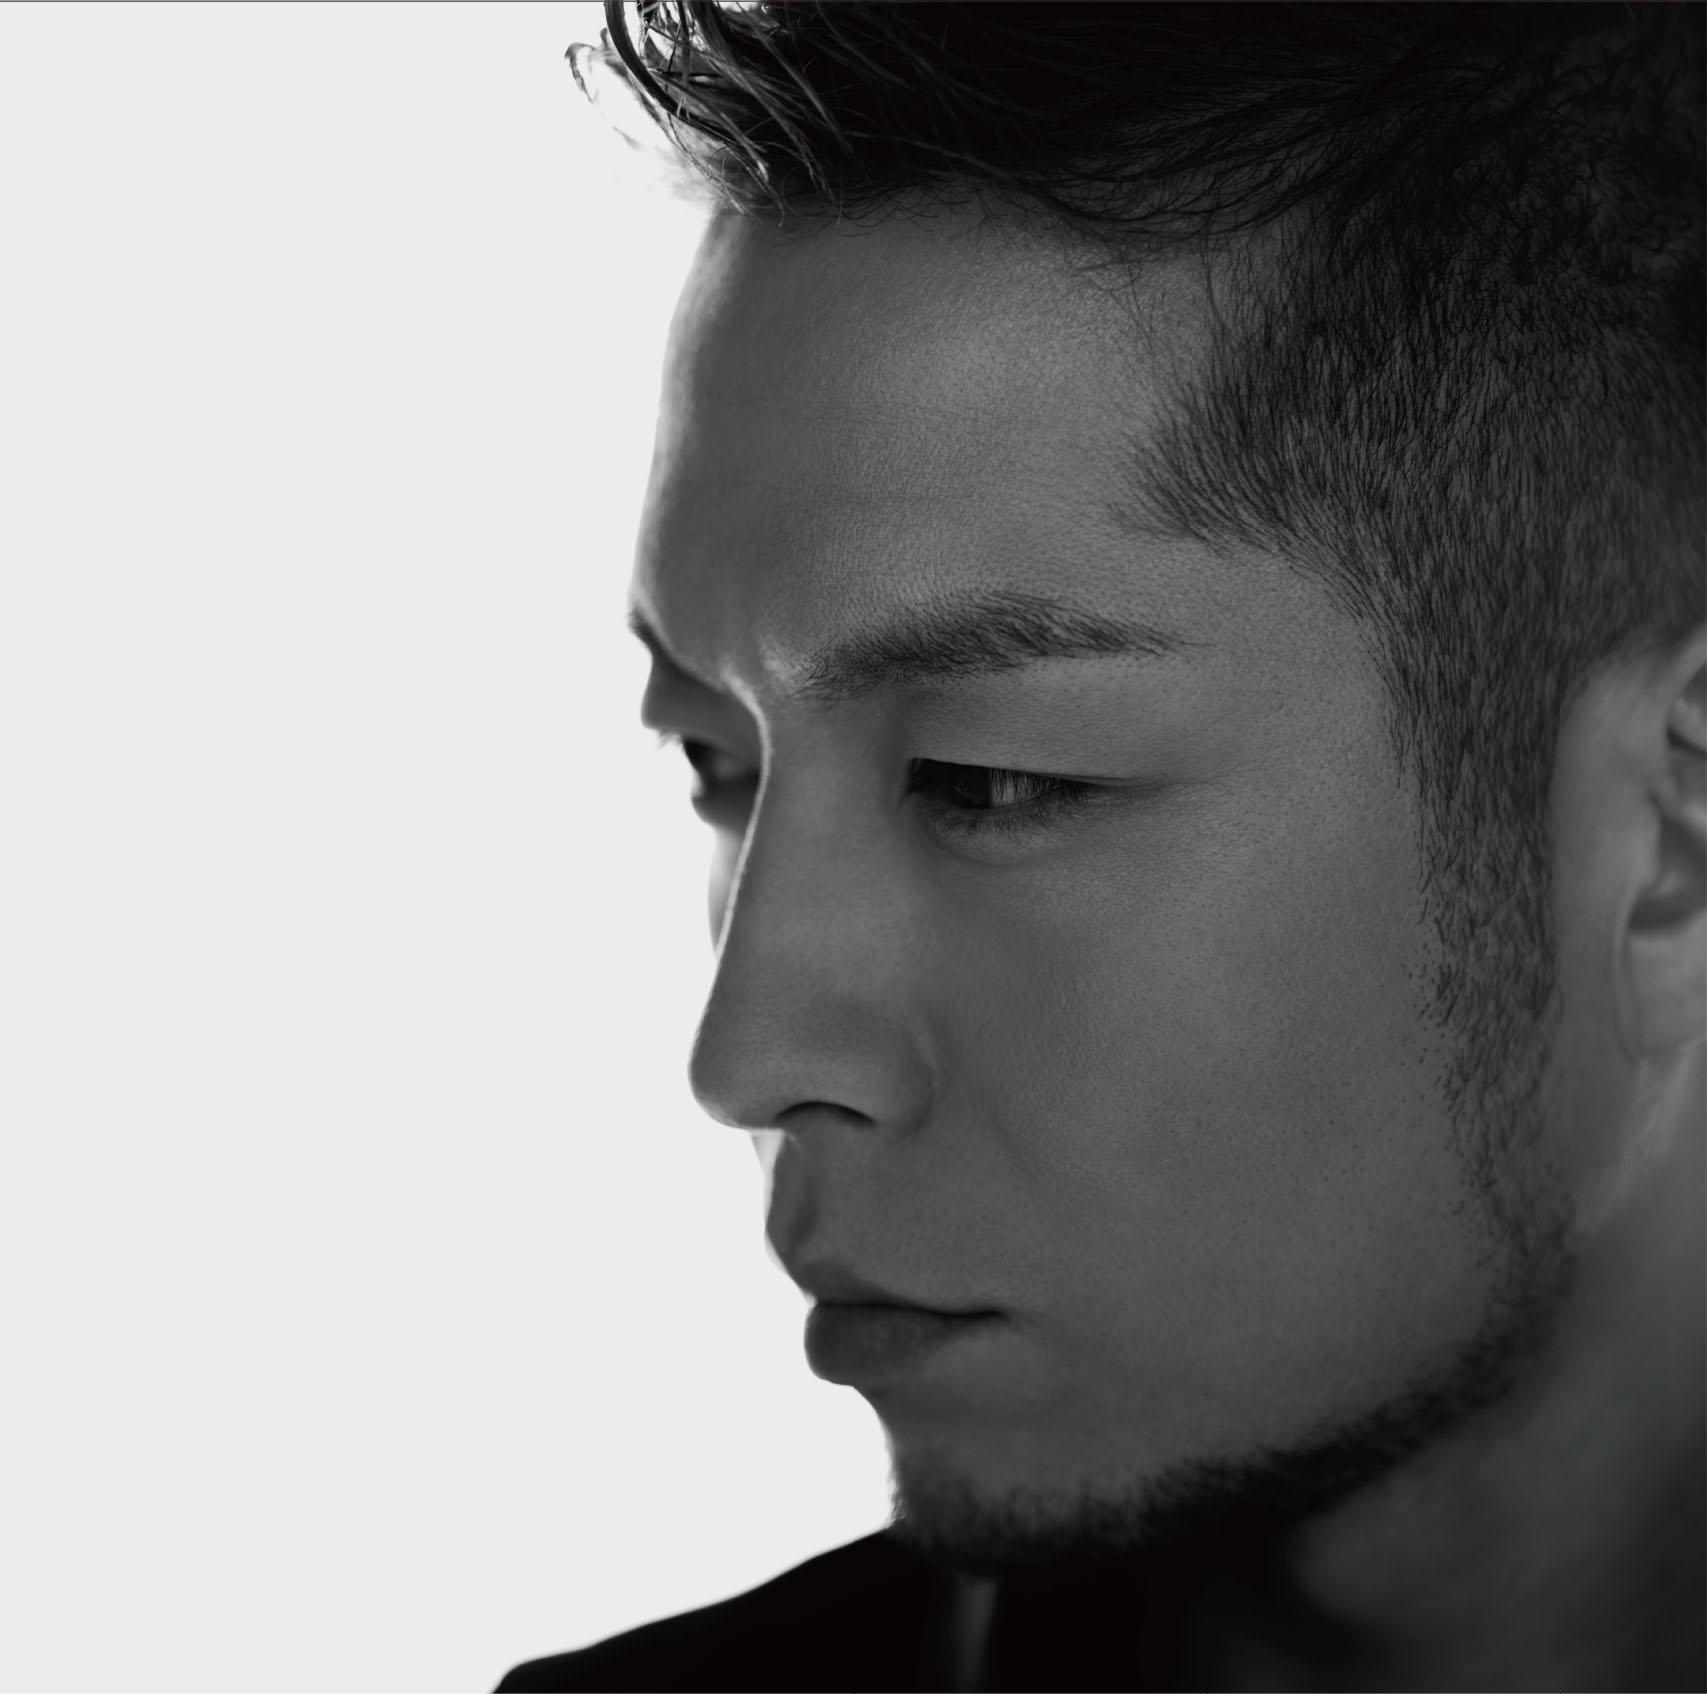 清木場俊介の画像 p1_12